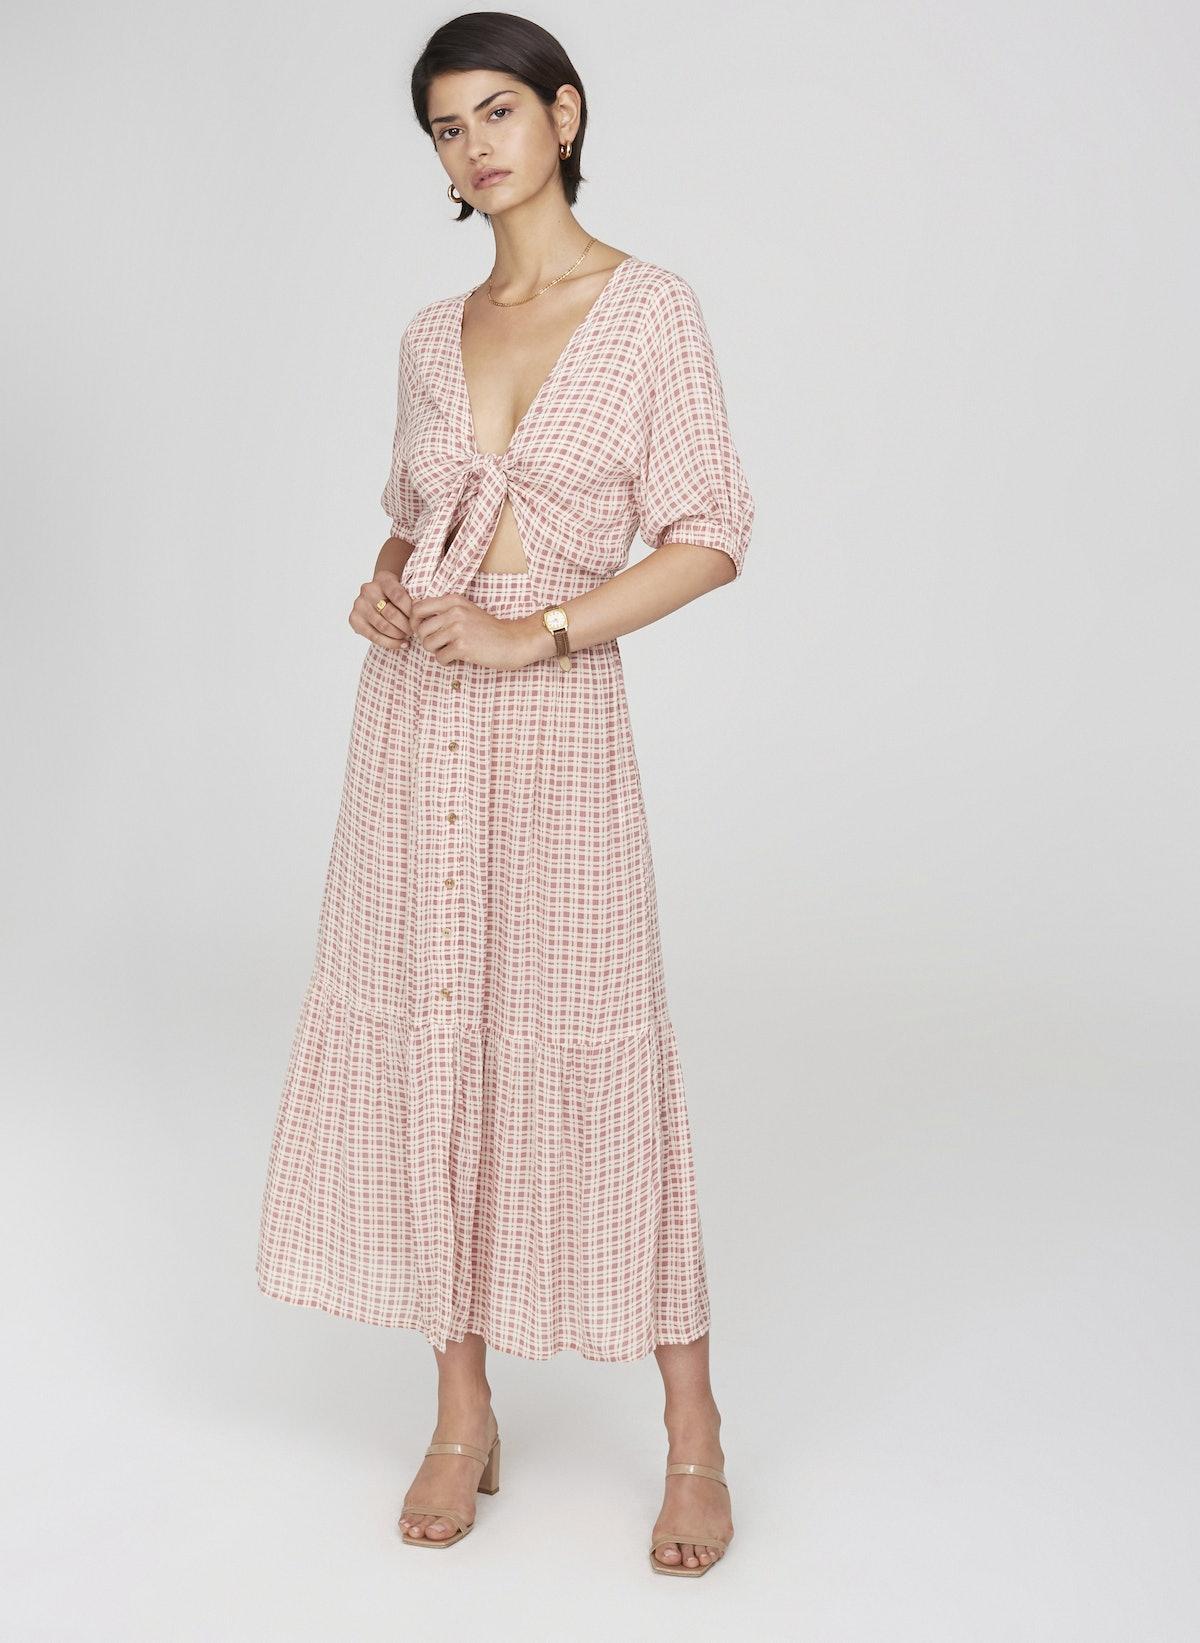 Emilinah Check Print Dress